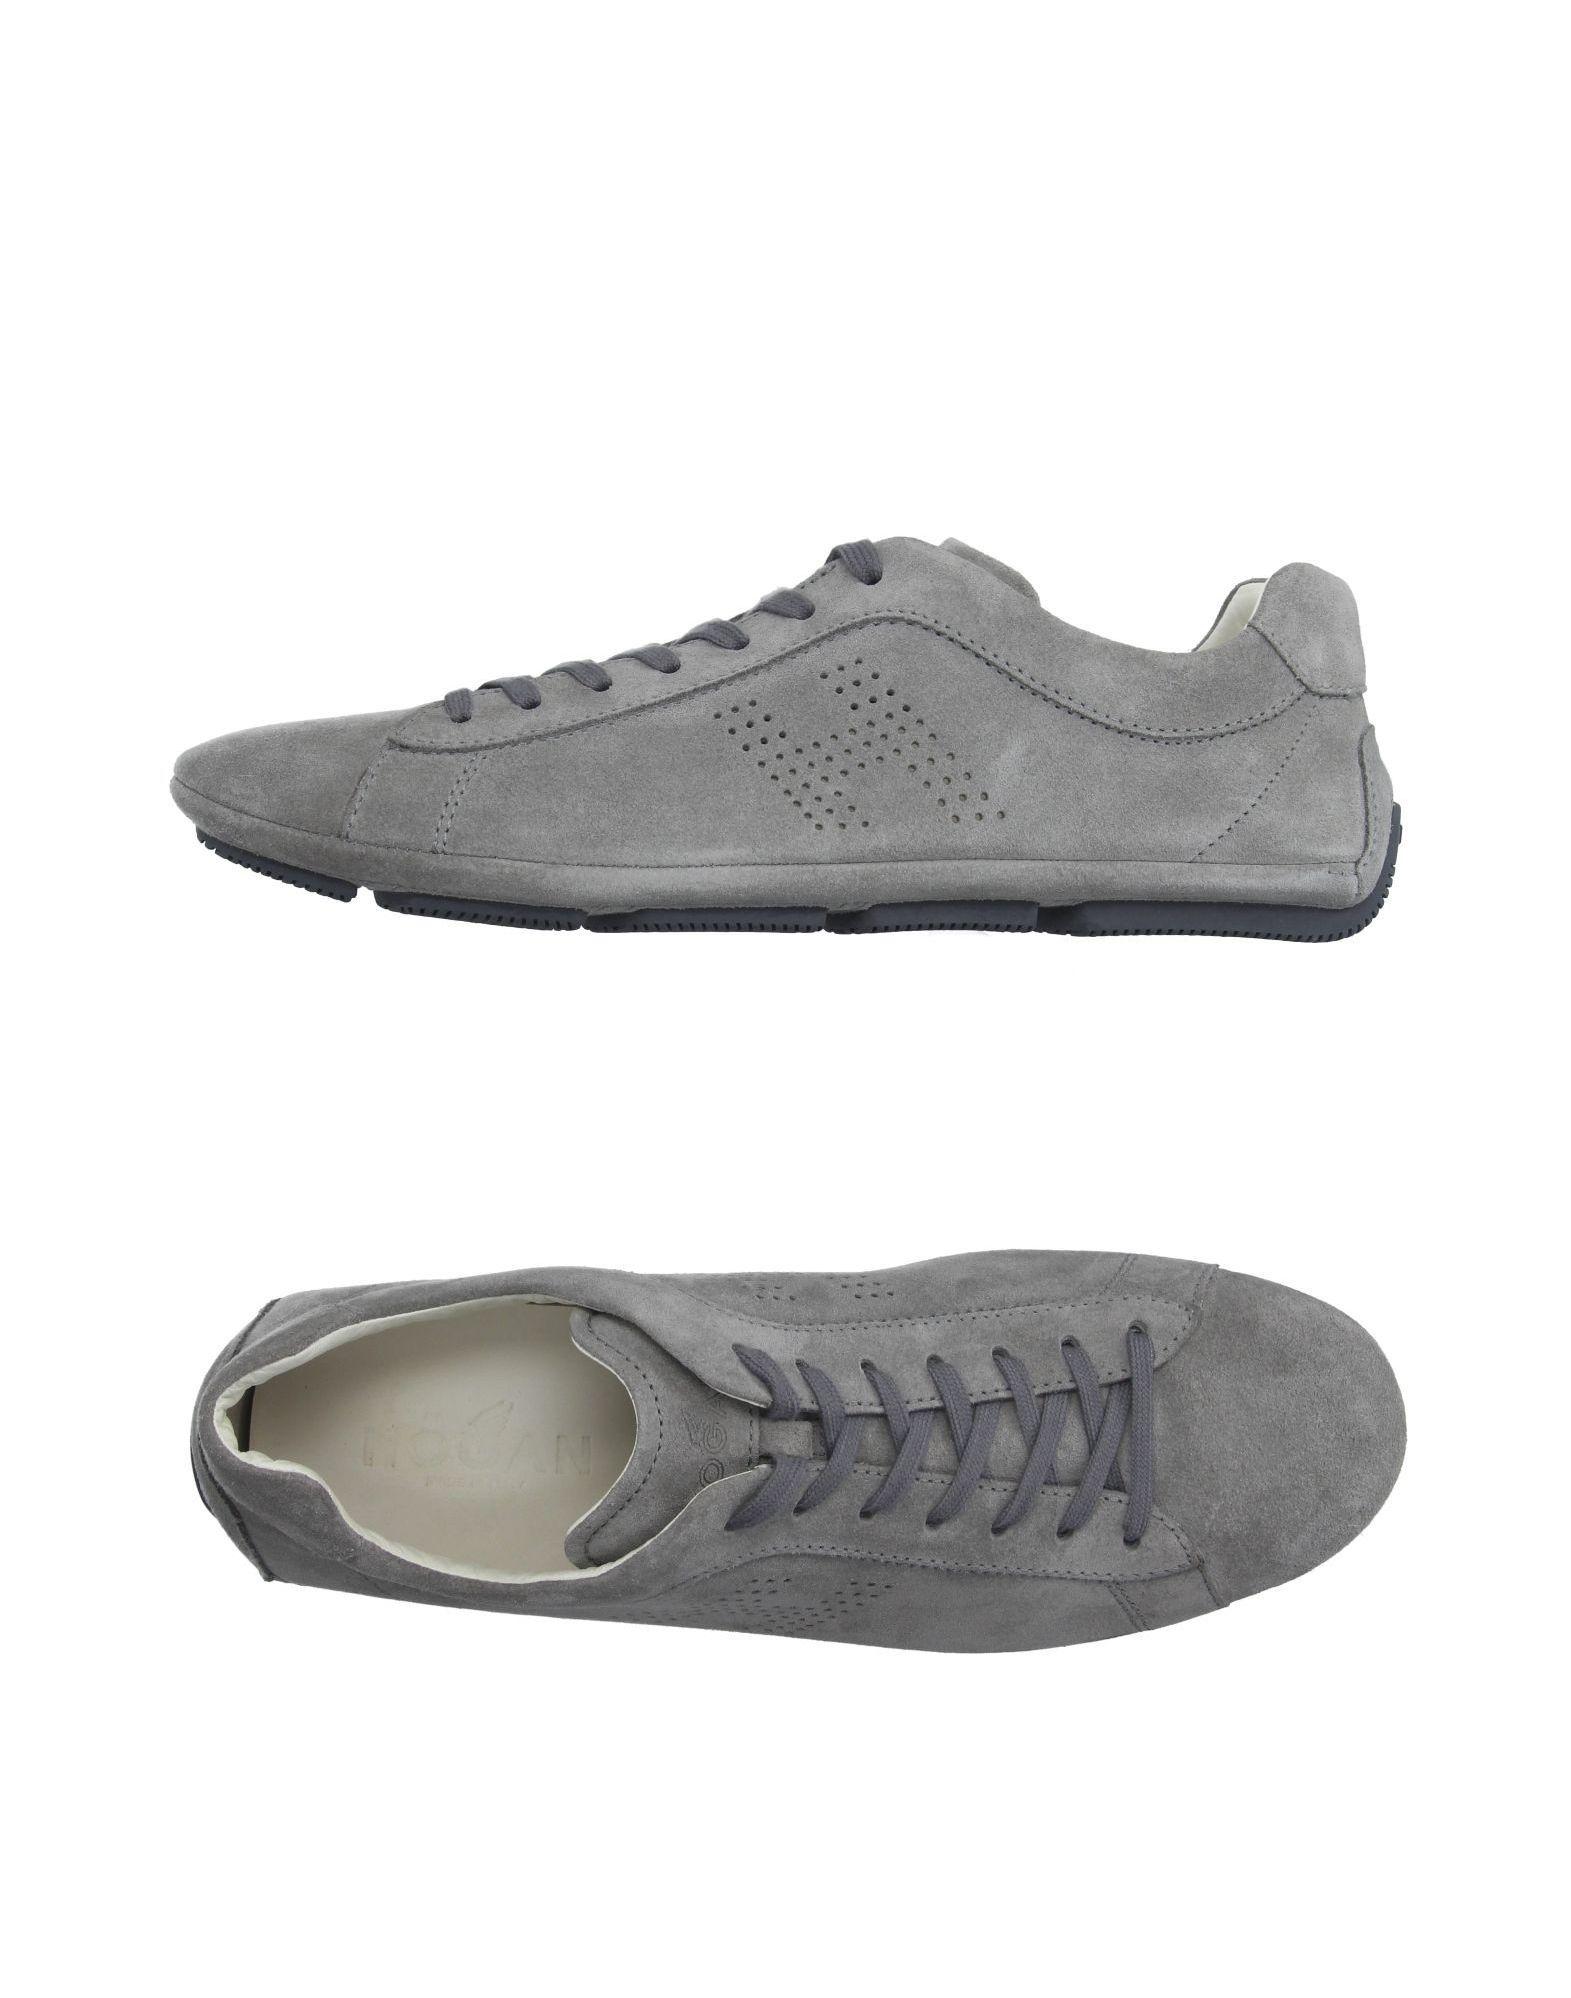 best website b4d3b 3709d HOGAN ΠΑΠΟΥΤΣΙΑ Παπούτσια τένις χαμηλά μόνο 210.00€ sale style fashion